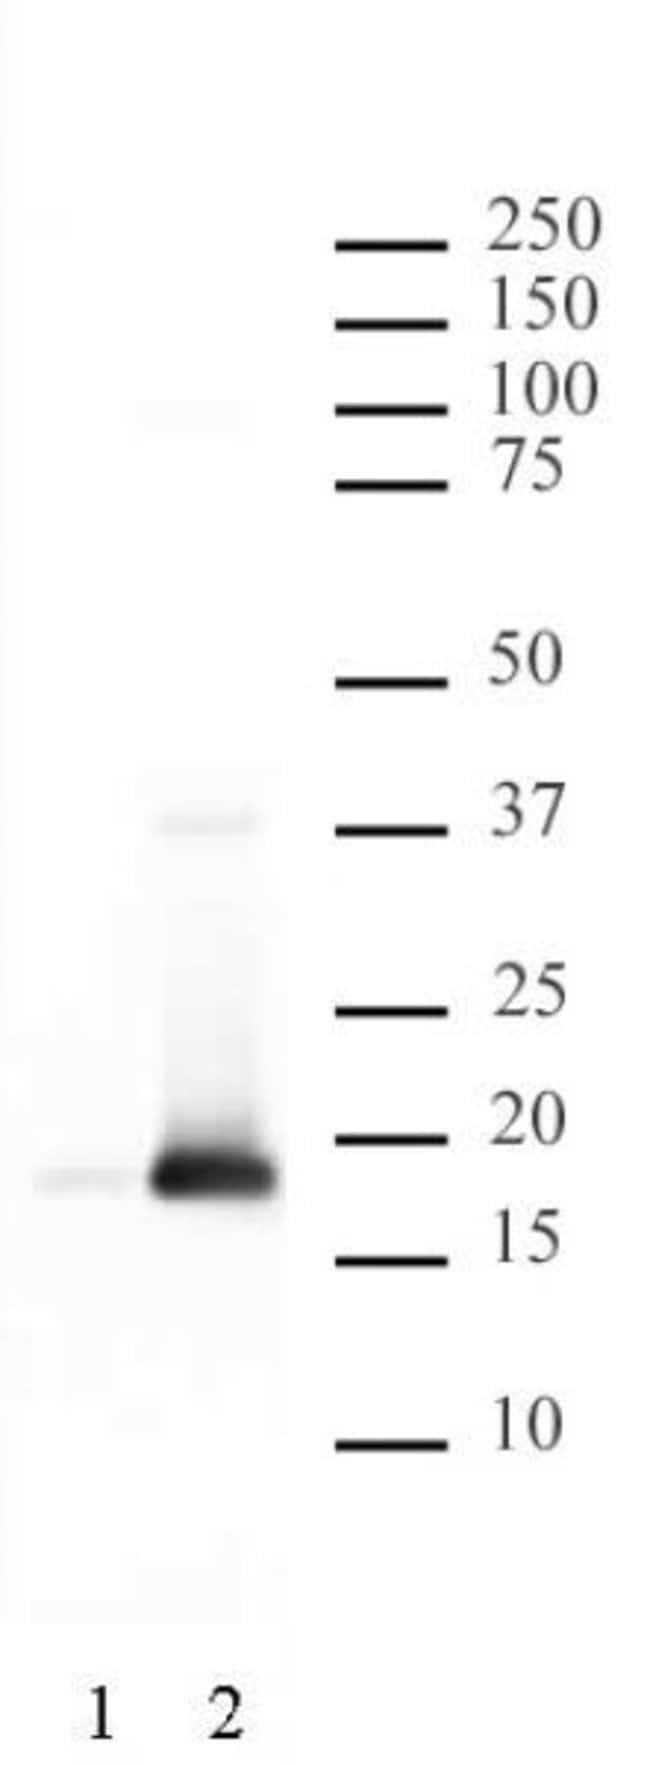 Histone H3S10ph Rabbit anti-Human, Unconjugated, Polyclonal, Active Motif:Antibodies:Primary